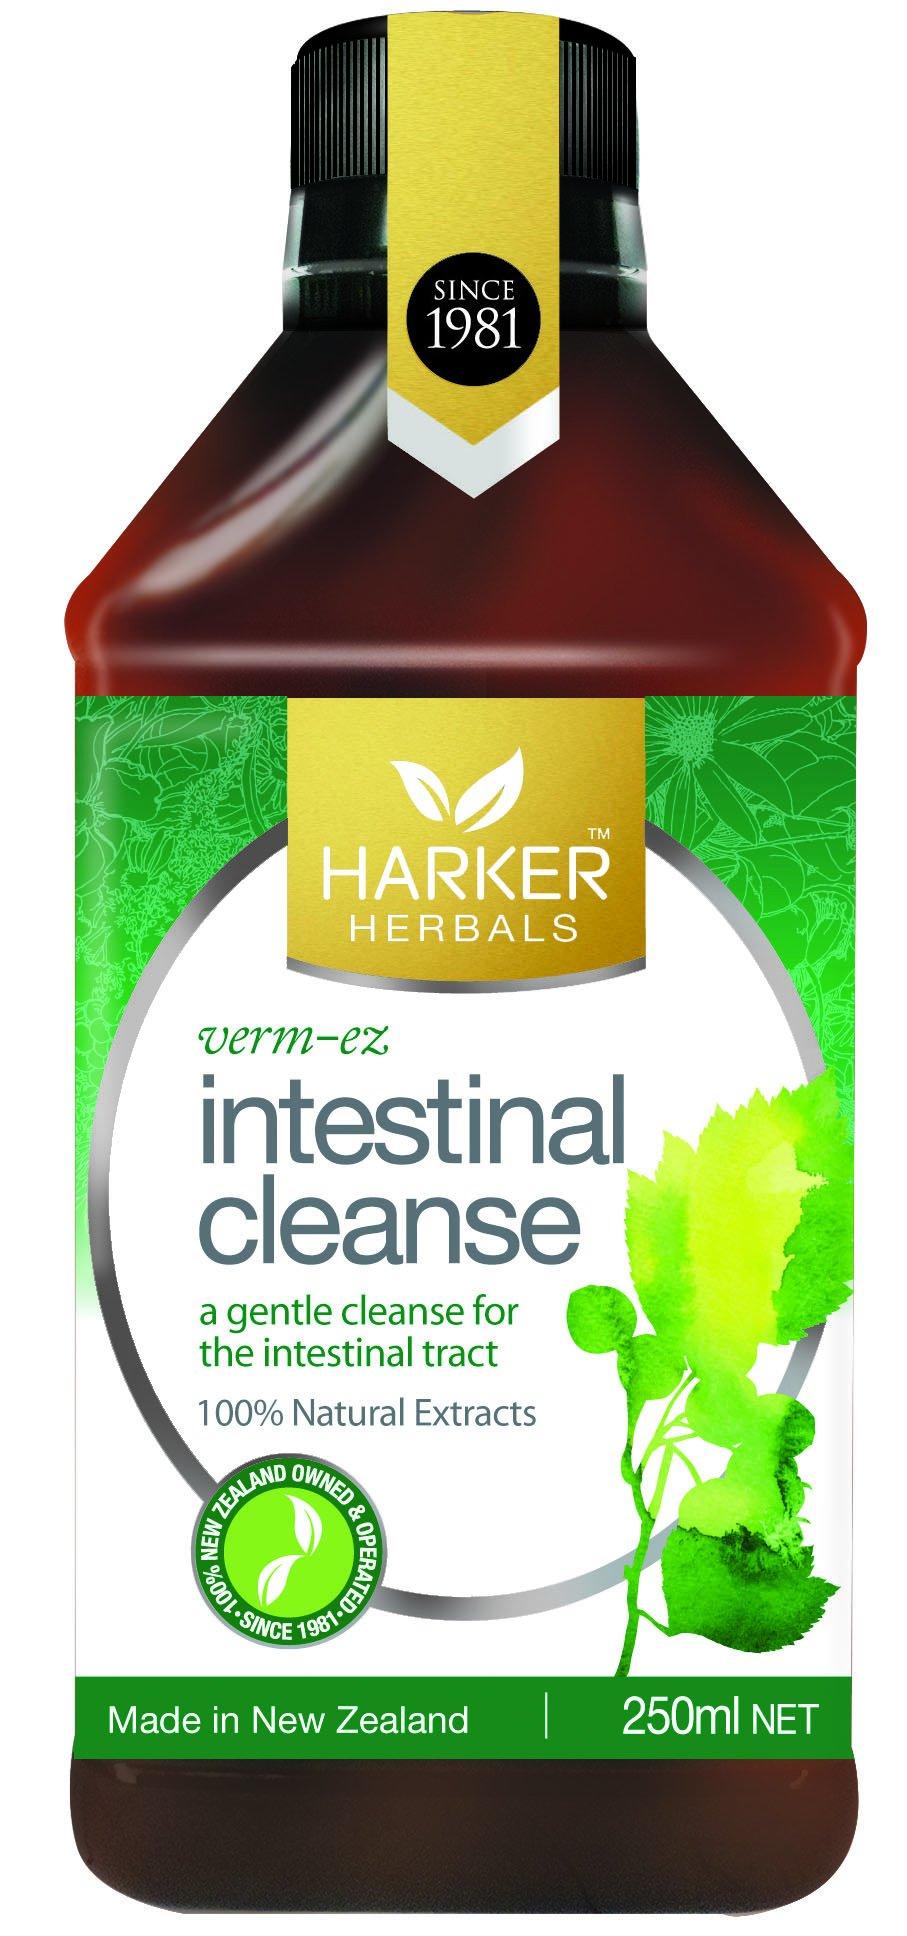 Harker Herbals Intestinal Cleanse